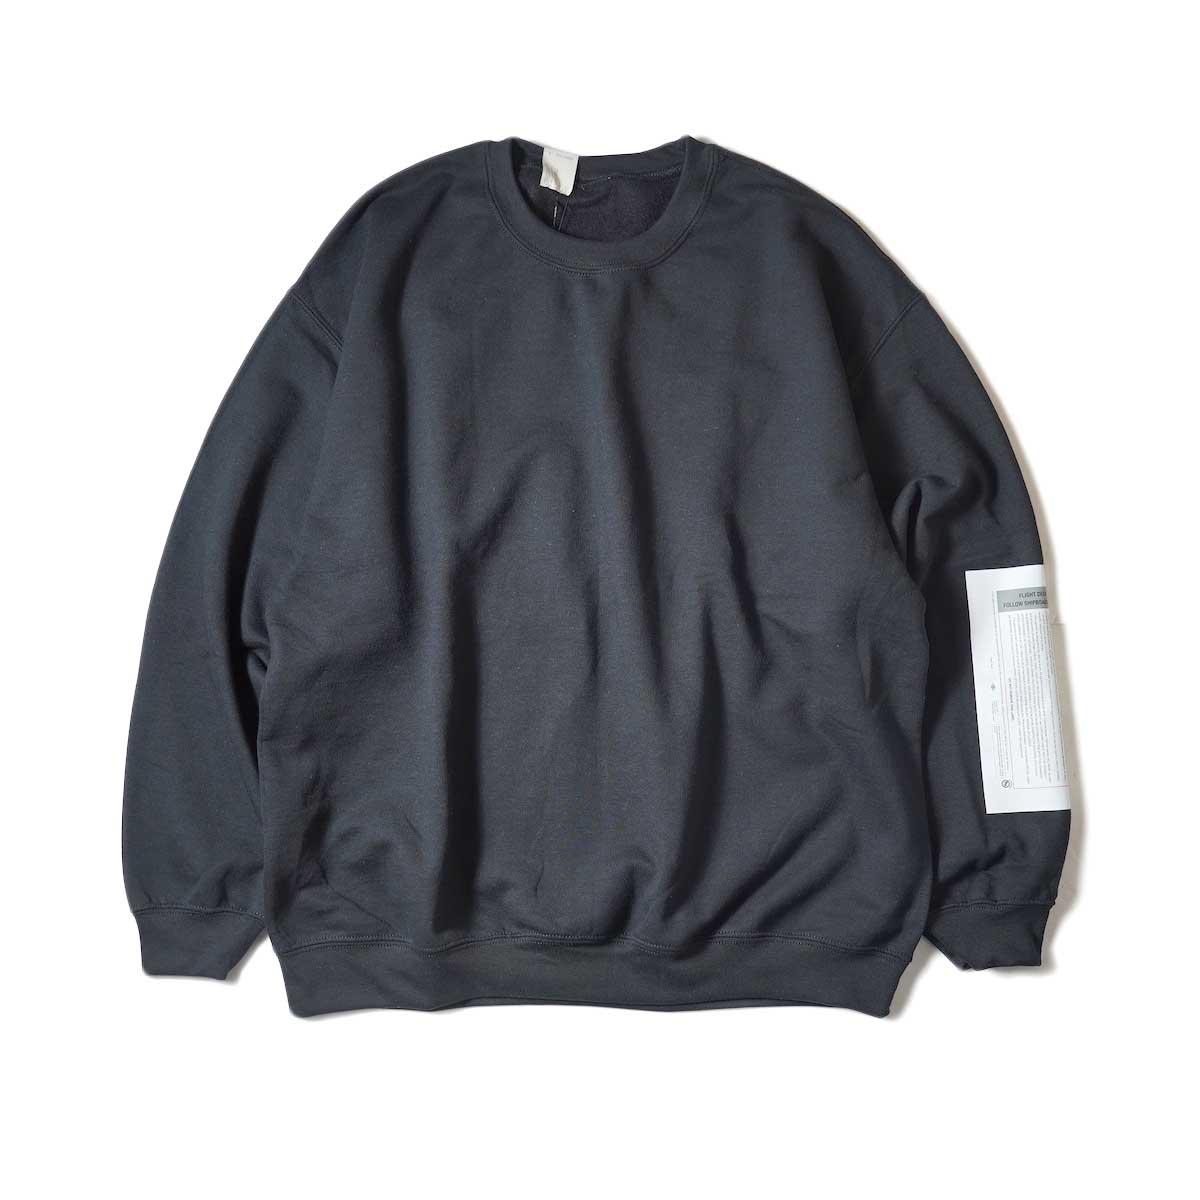 N.HOOLYWOOD / 9212-CS85 Crew Neck Sweat Shirt (Black)正面